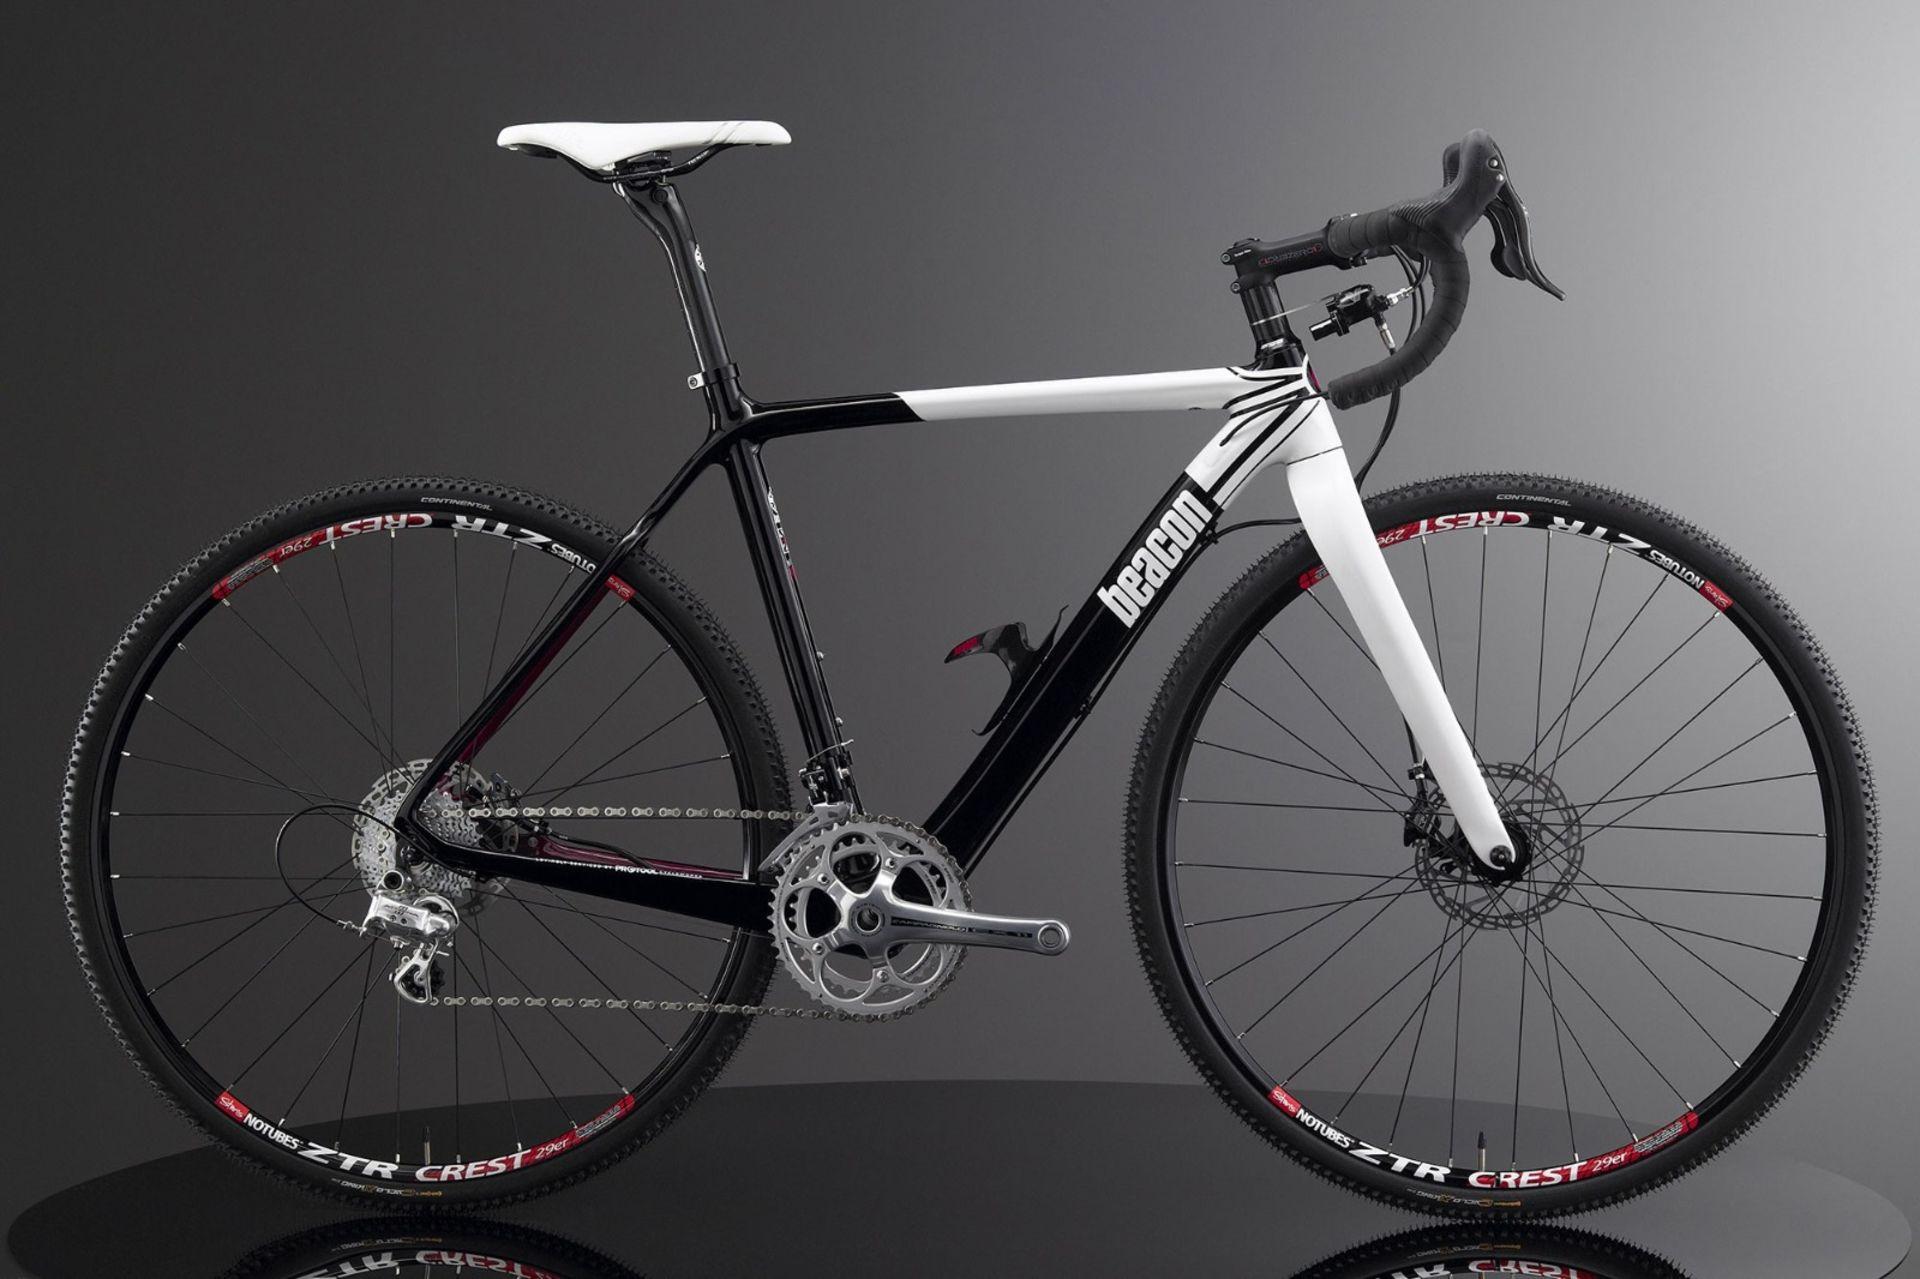 Lot 11 - 1 x Beacon Model BF-45, Size 540, Carbon Fibre Bike Frame in Black & White.